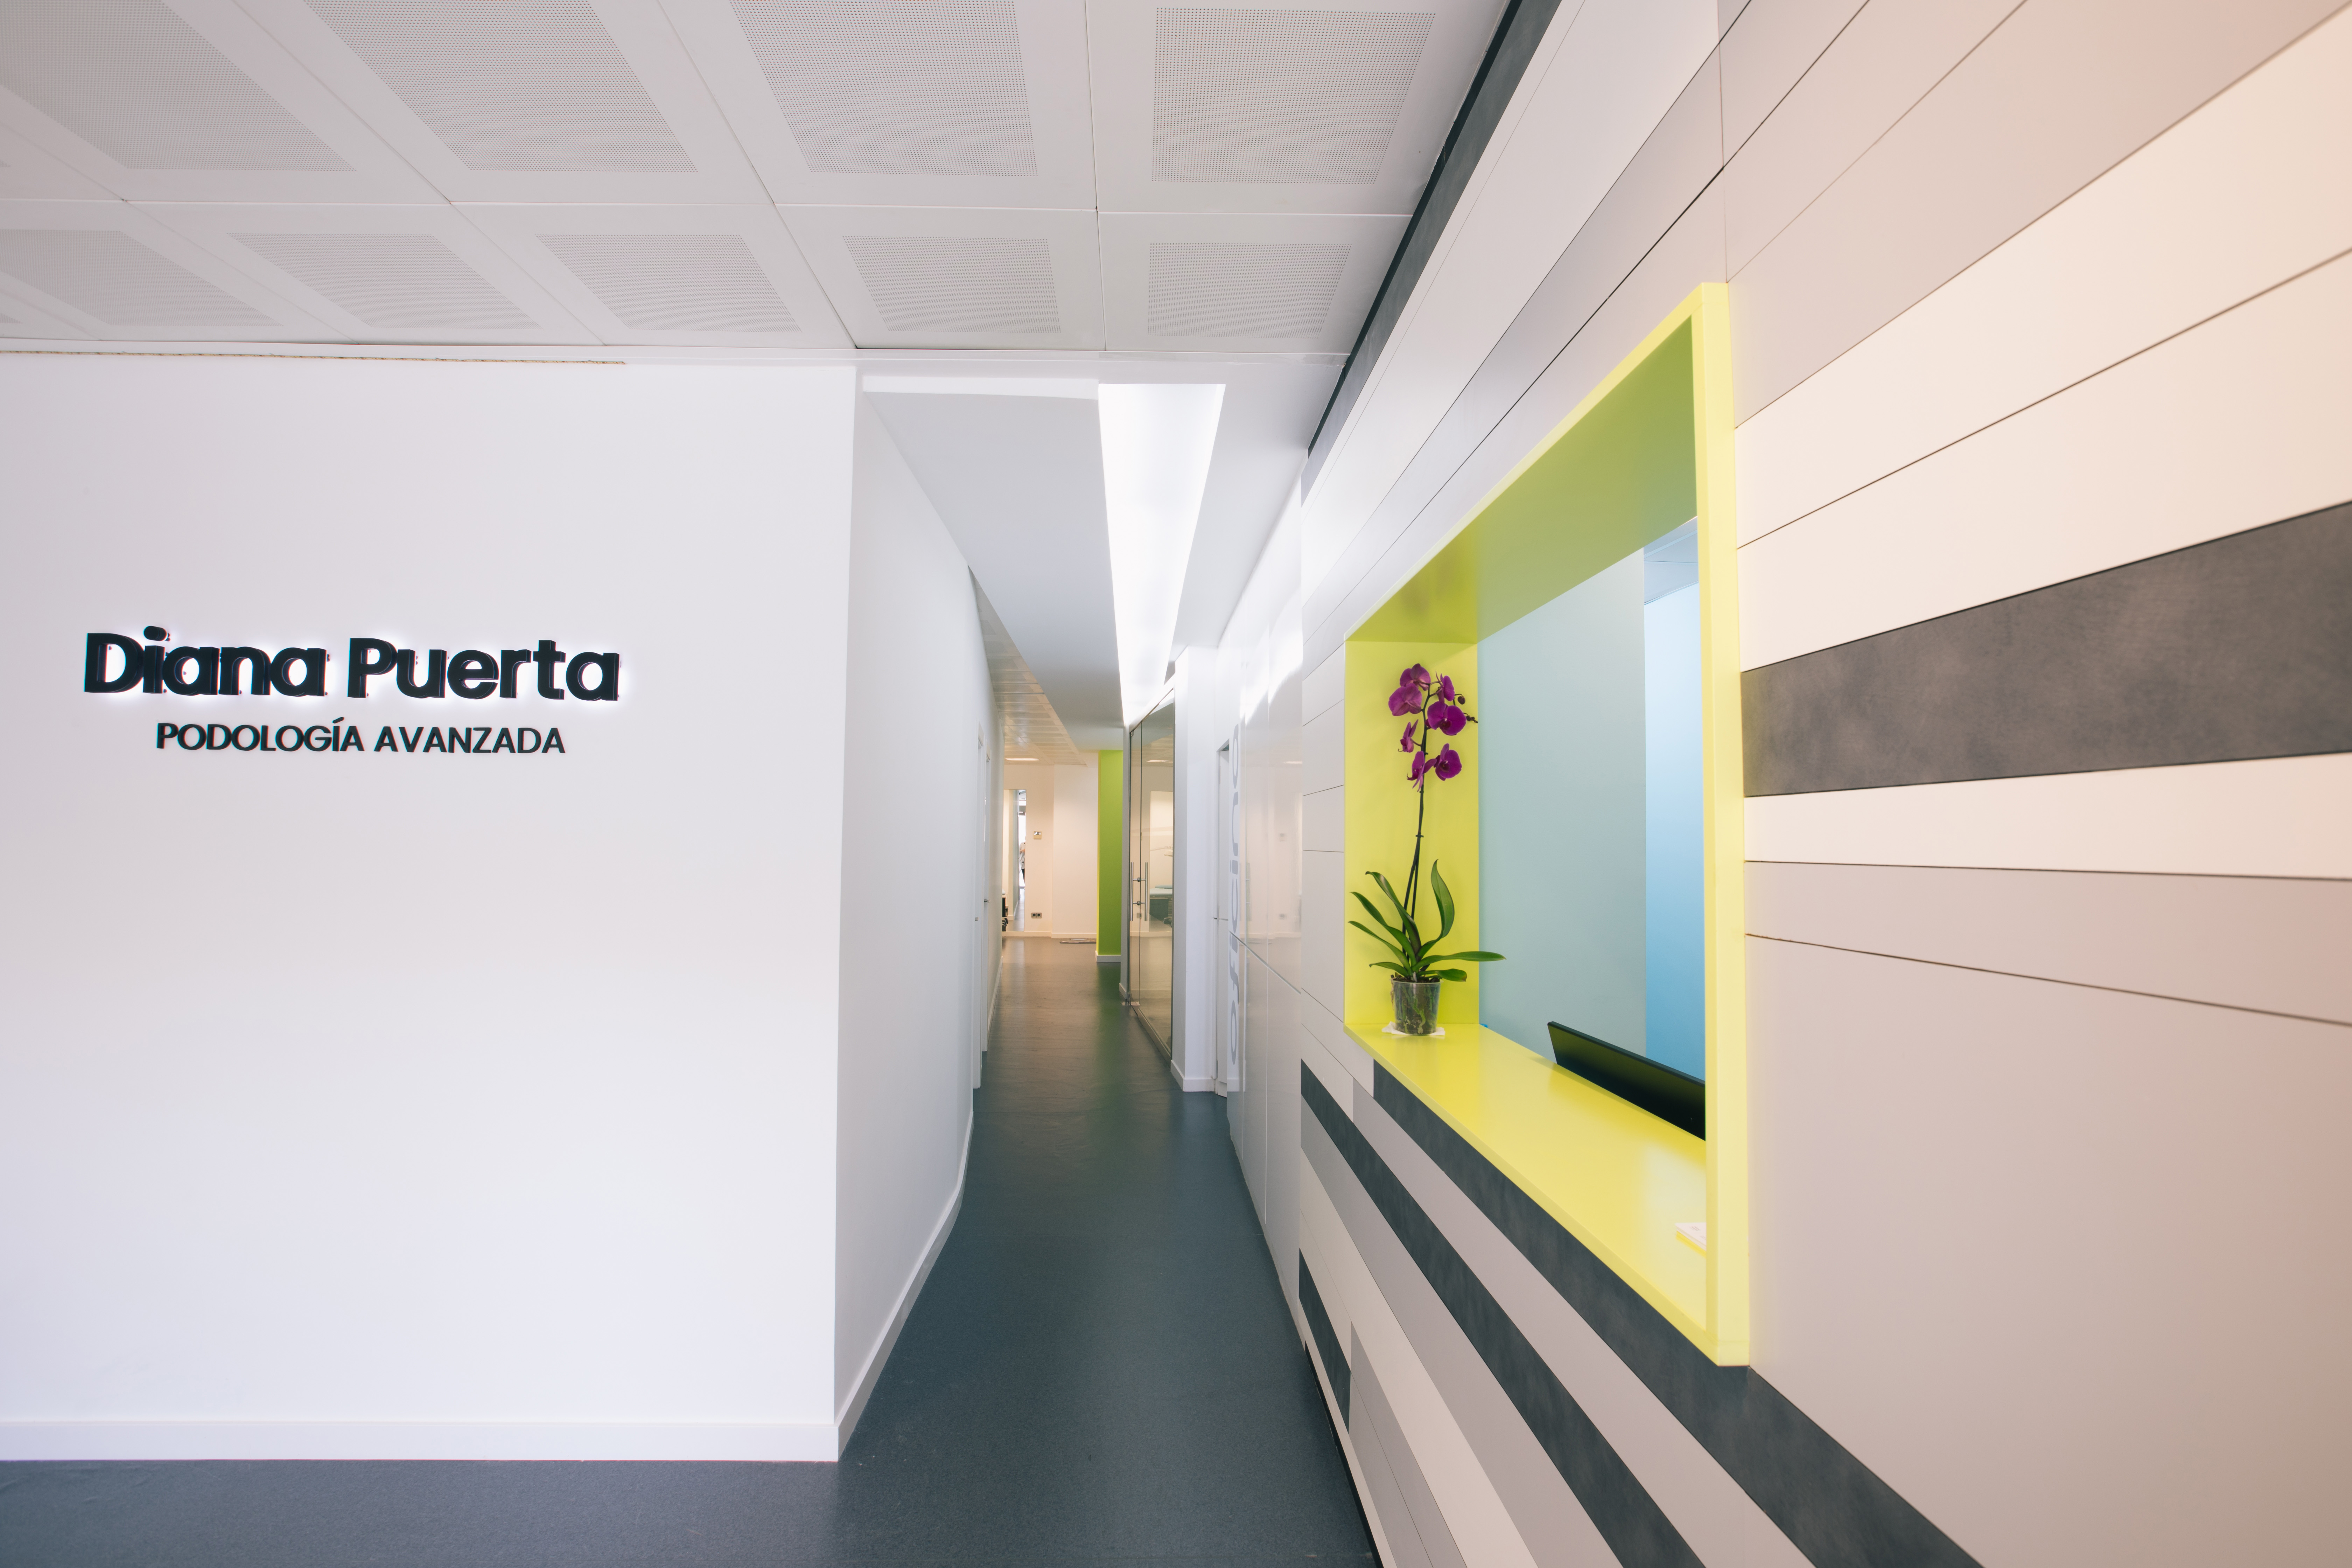 clinica_podologia_diana_puerta_san_juan_alicante